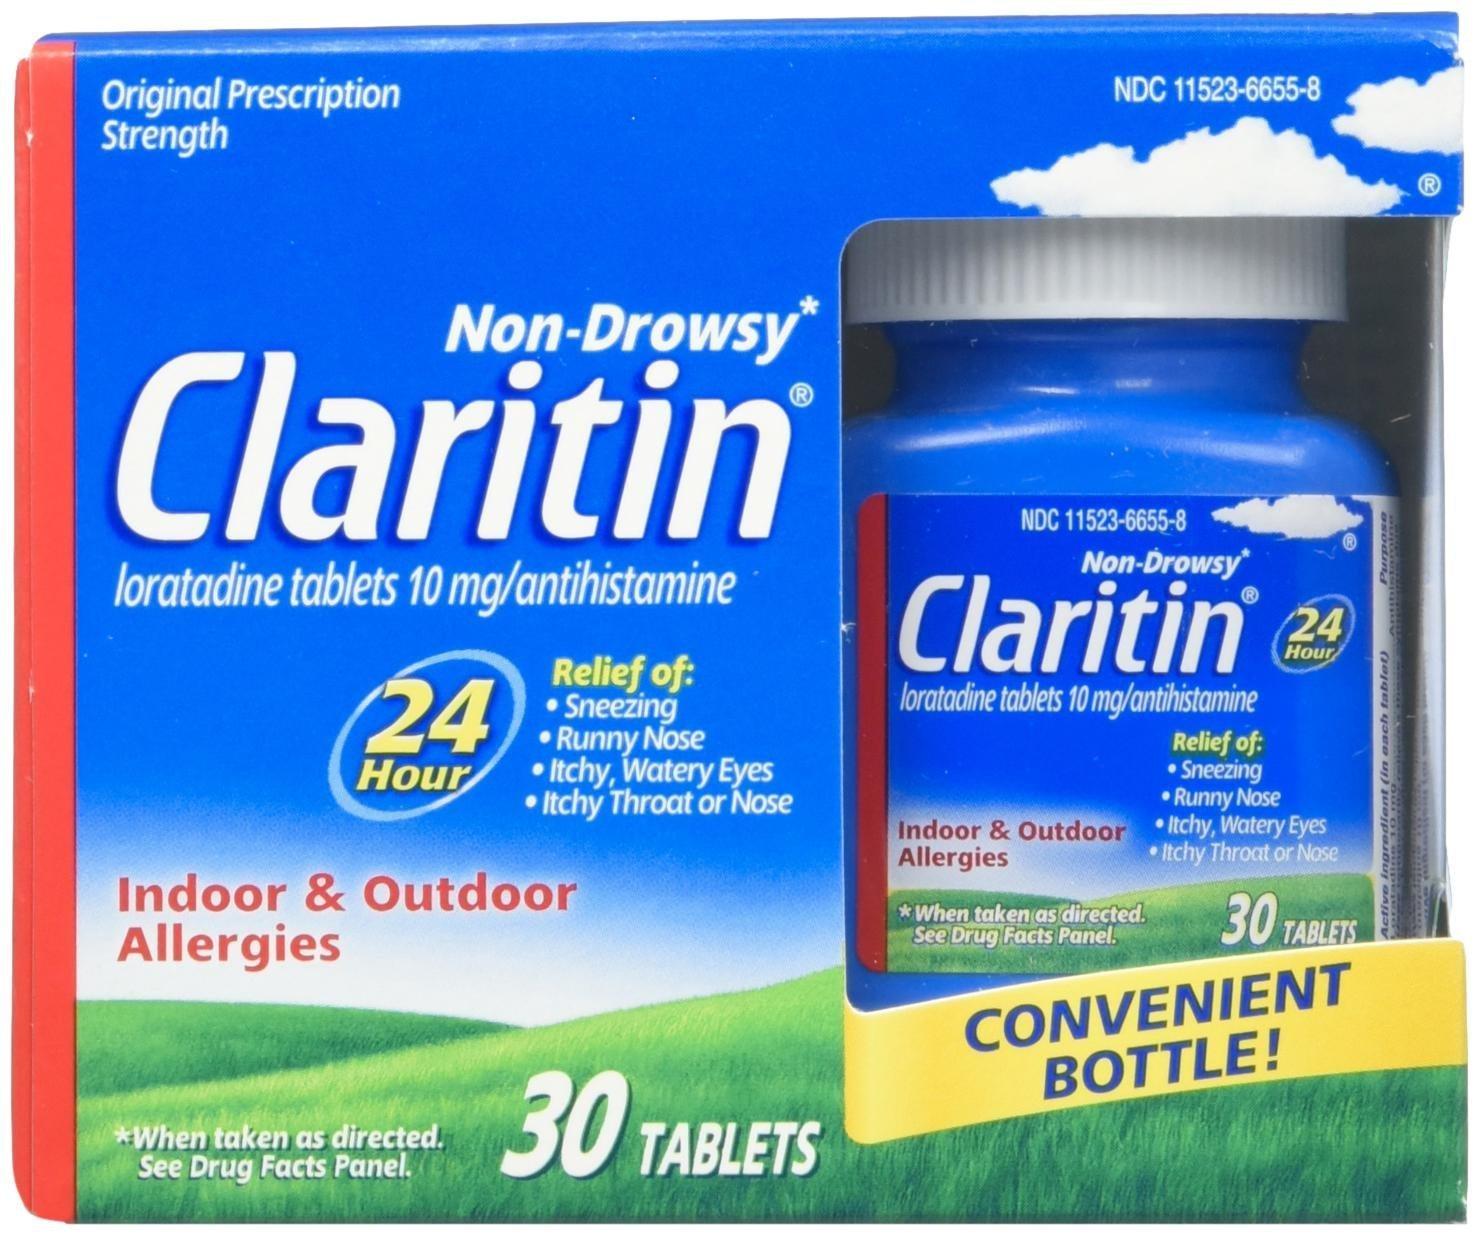 Claritin, Non-drowsy, Indoor & Outdoor Allergies, Antihistamine - 30 Tablets.